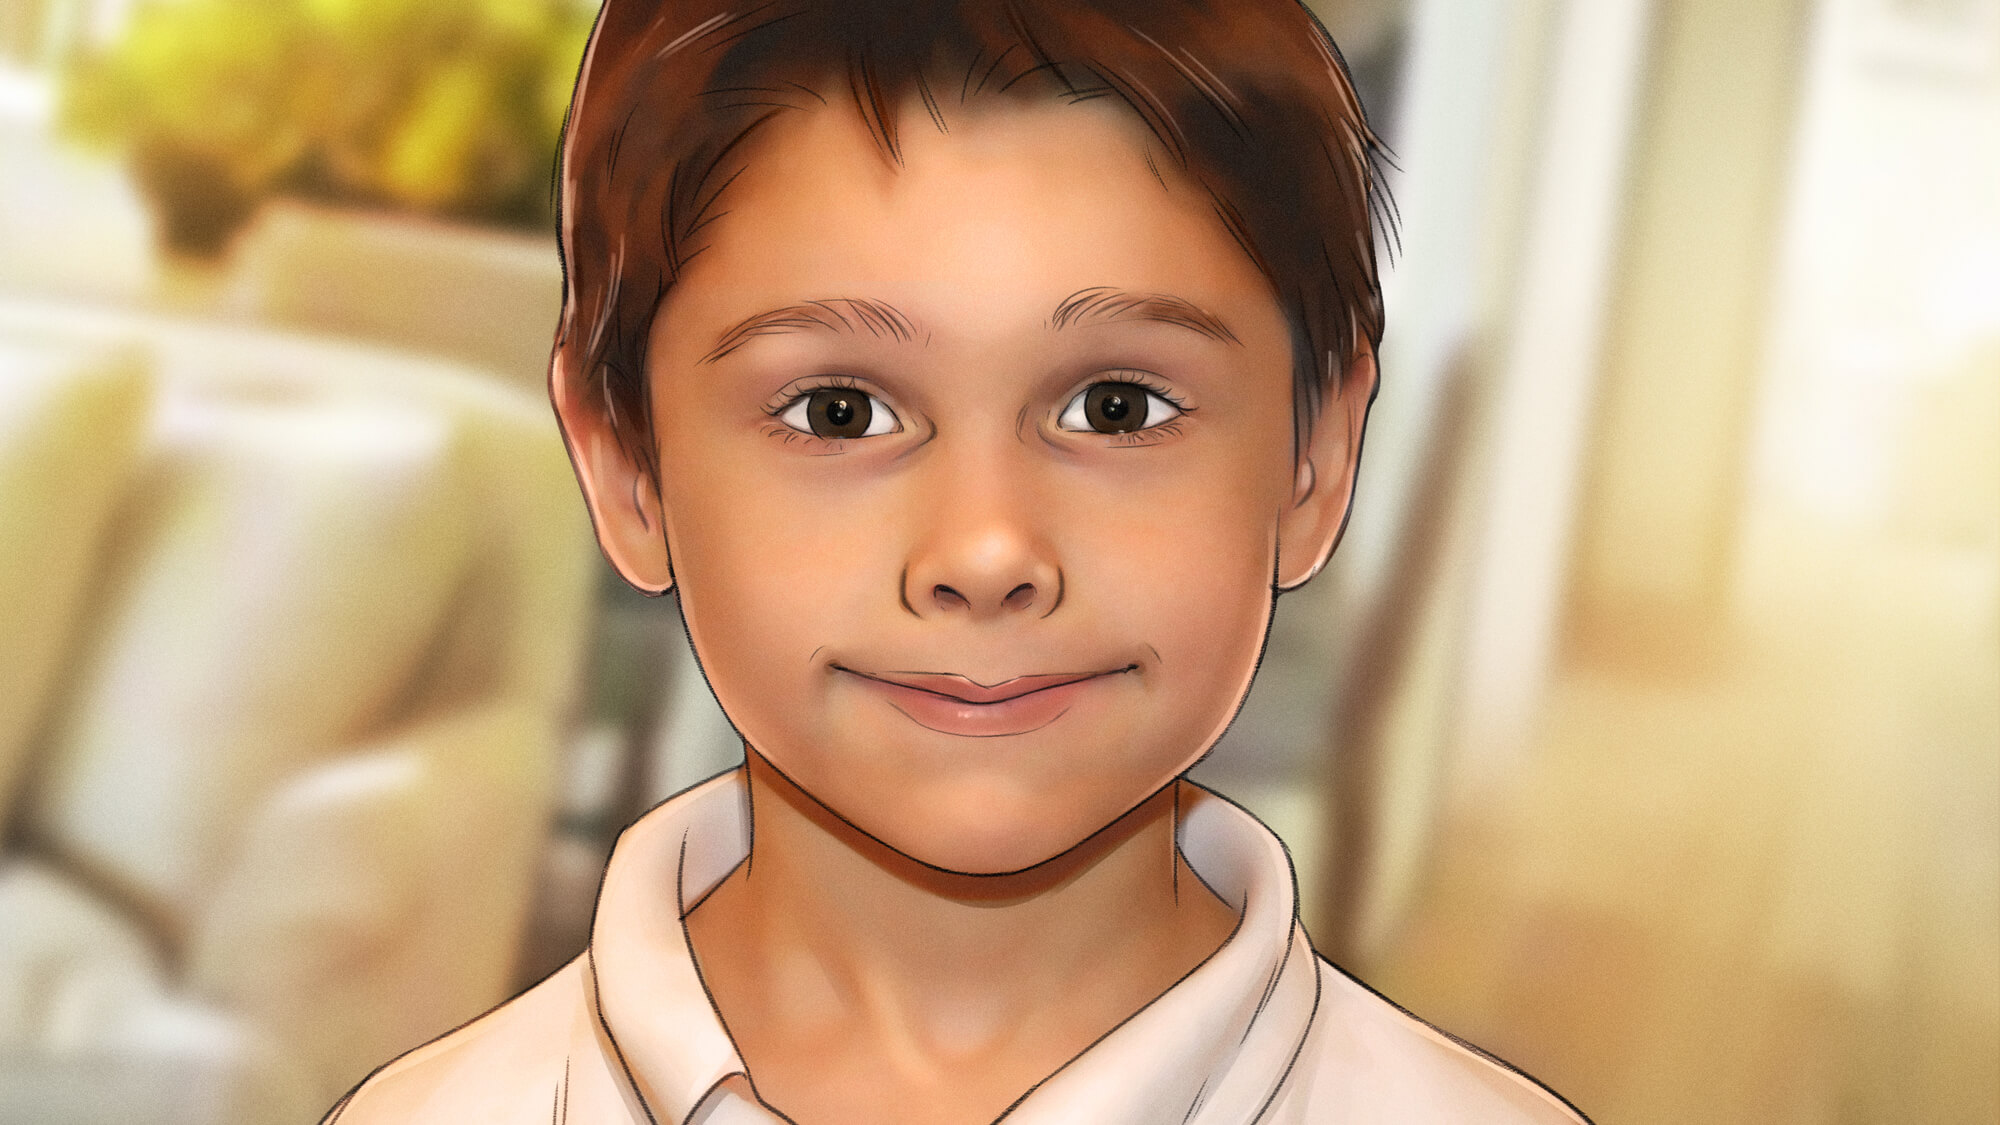 Kinder_Storyboard_1.jpg